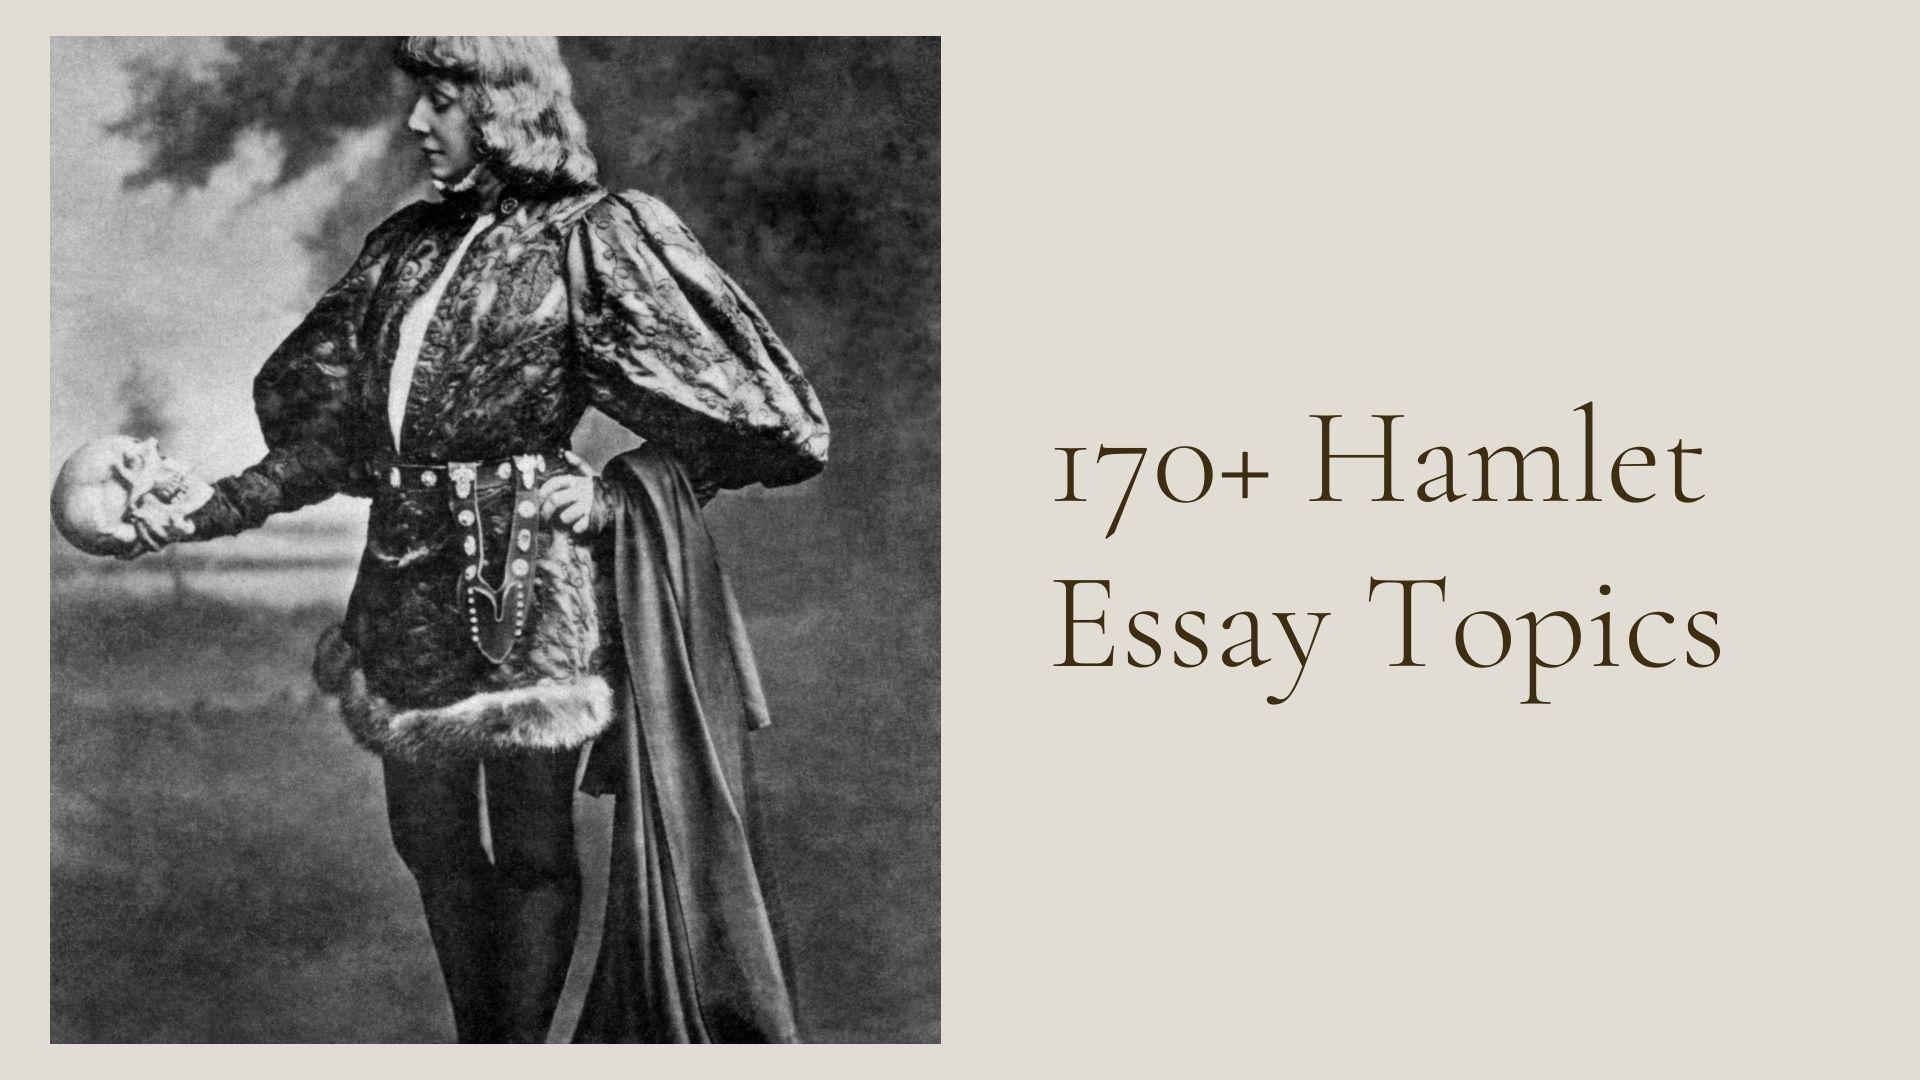 Hamlet Essay Topics